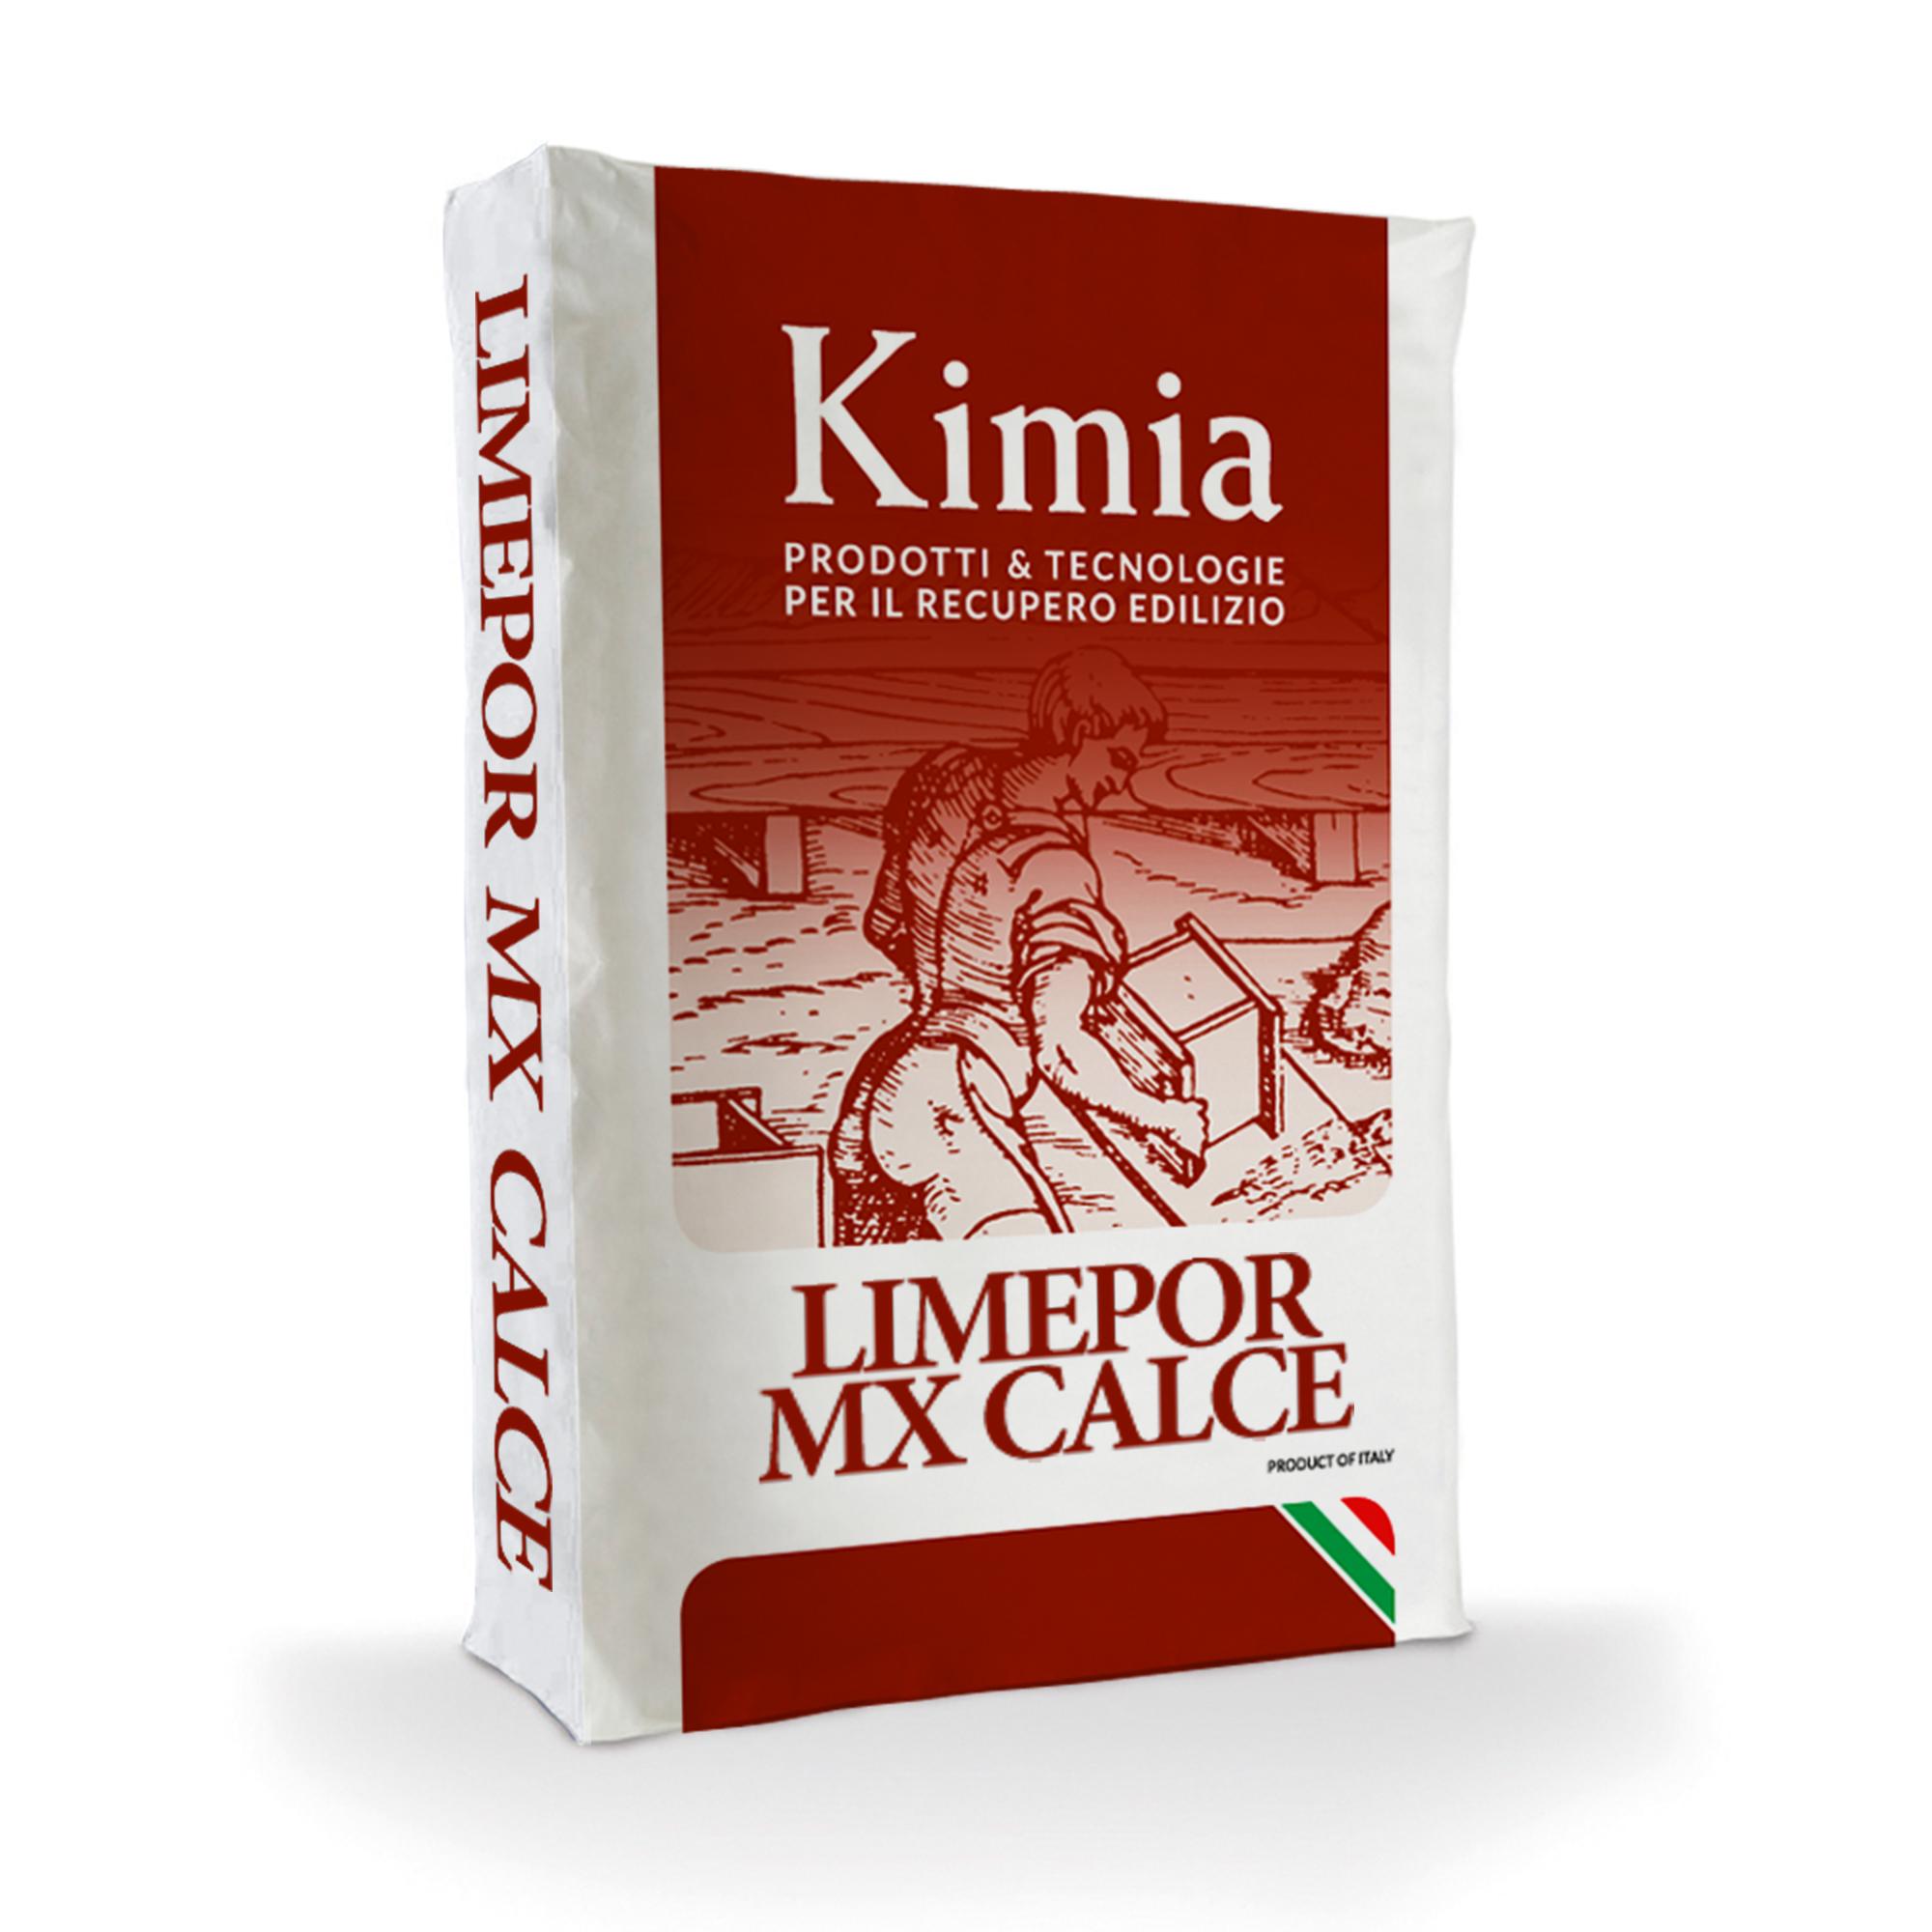 Limepor MX CALCE